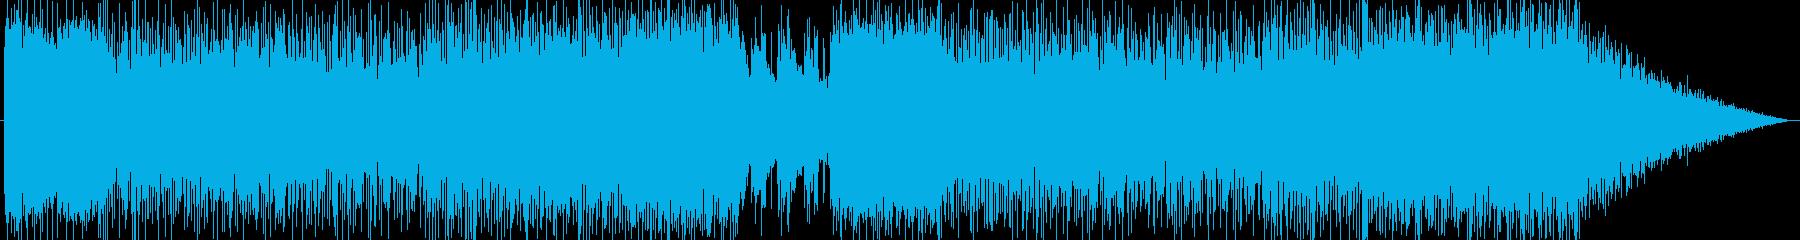 「HR/HM」「DARK」BGM224の再生済みの波形